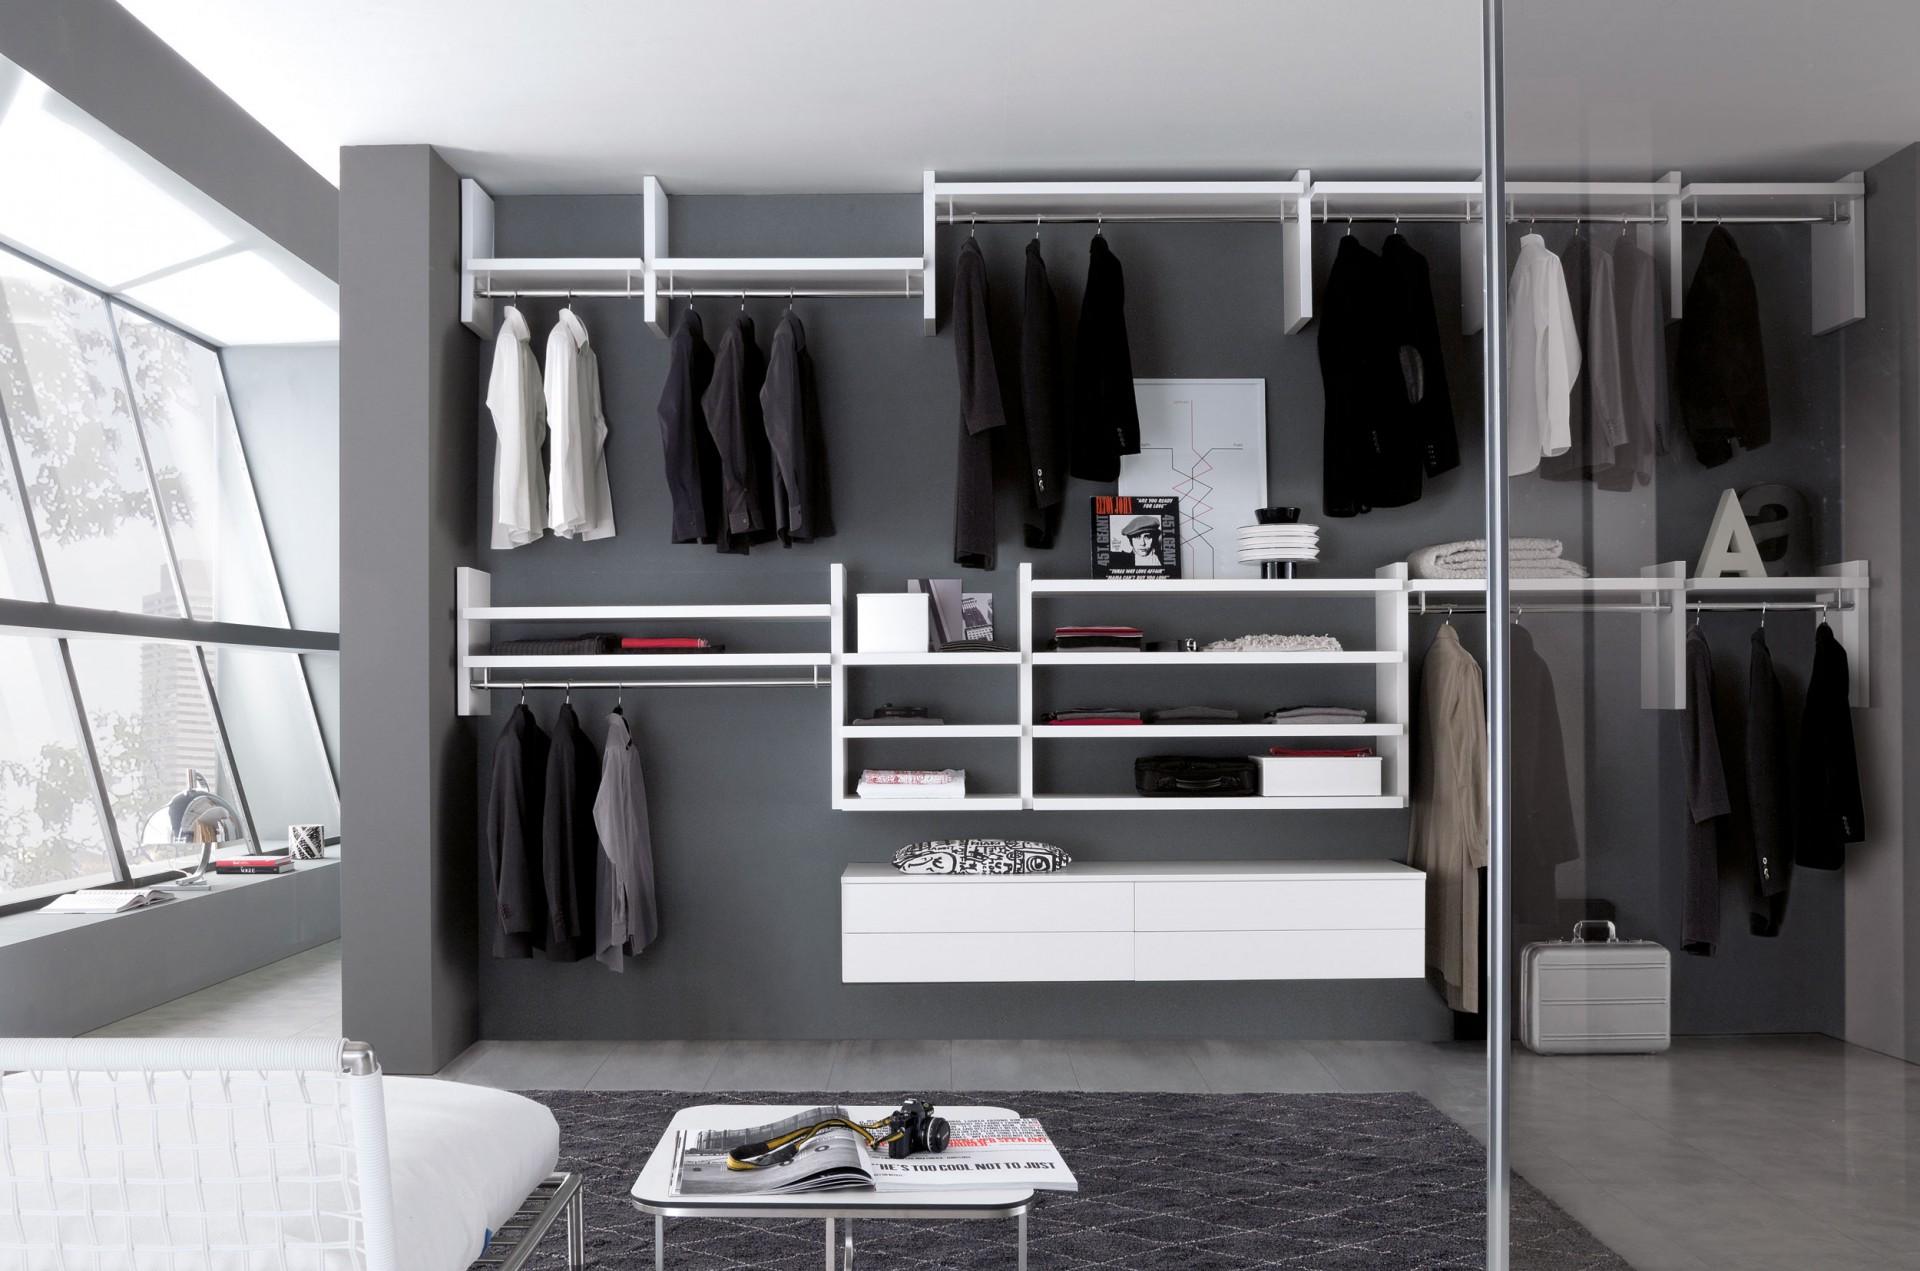 08-millimetrica-walk-in-closet-design-misuraemme-2.jpg